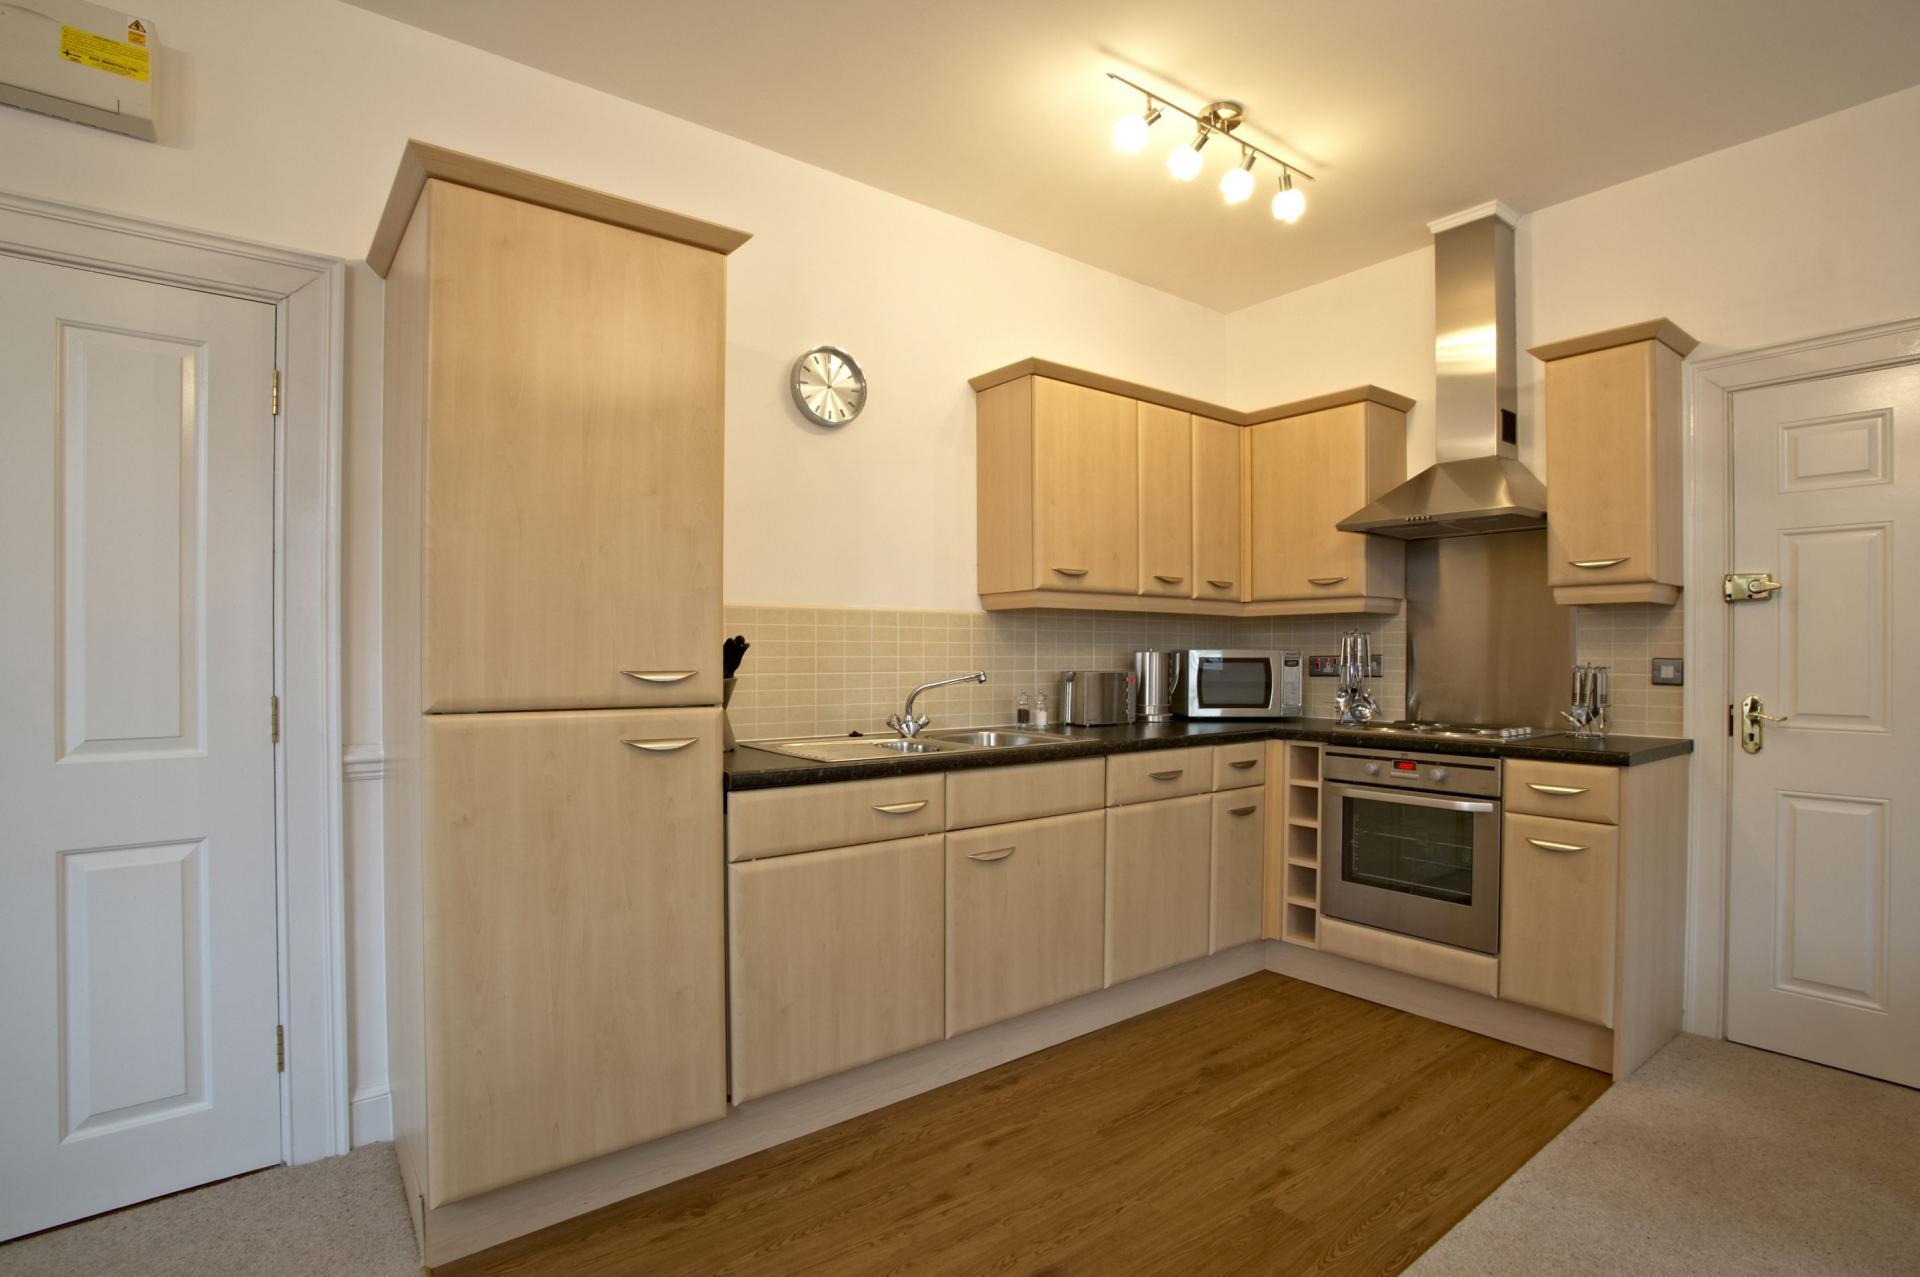 Kitchen at Villetts House Apartment, Centre, Swindon